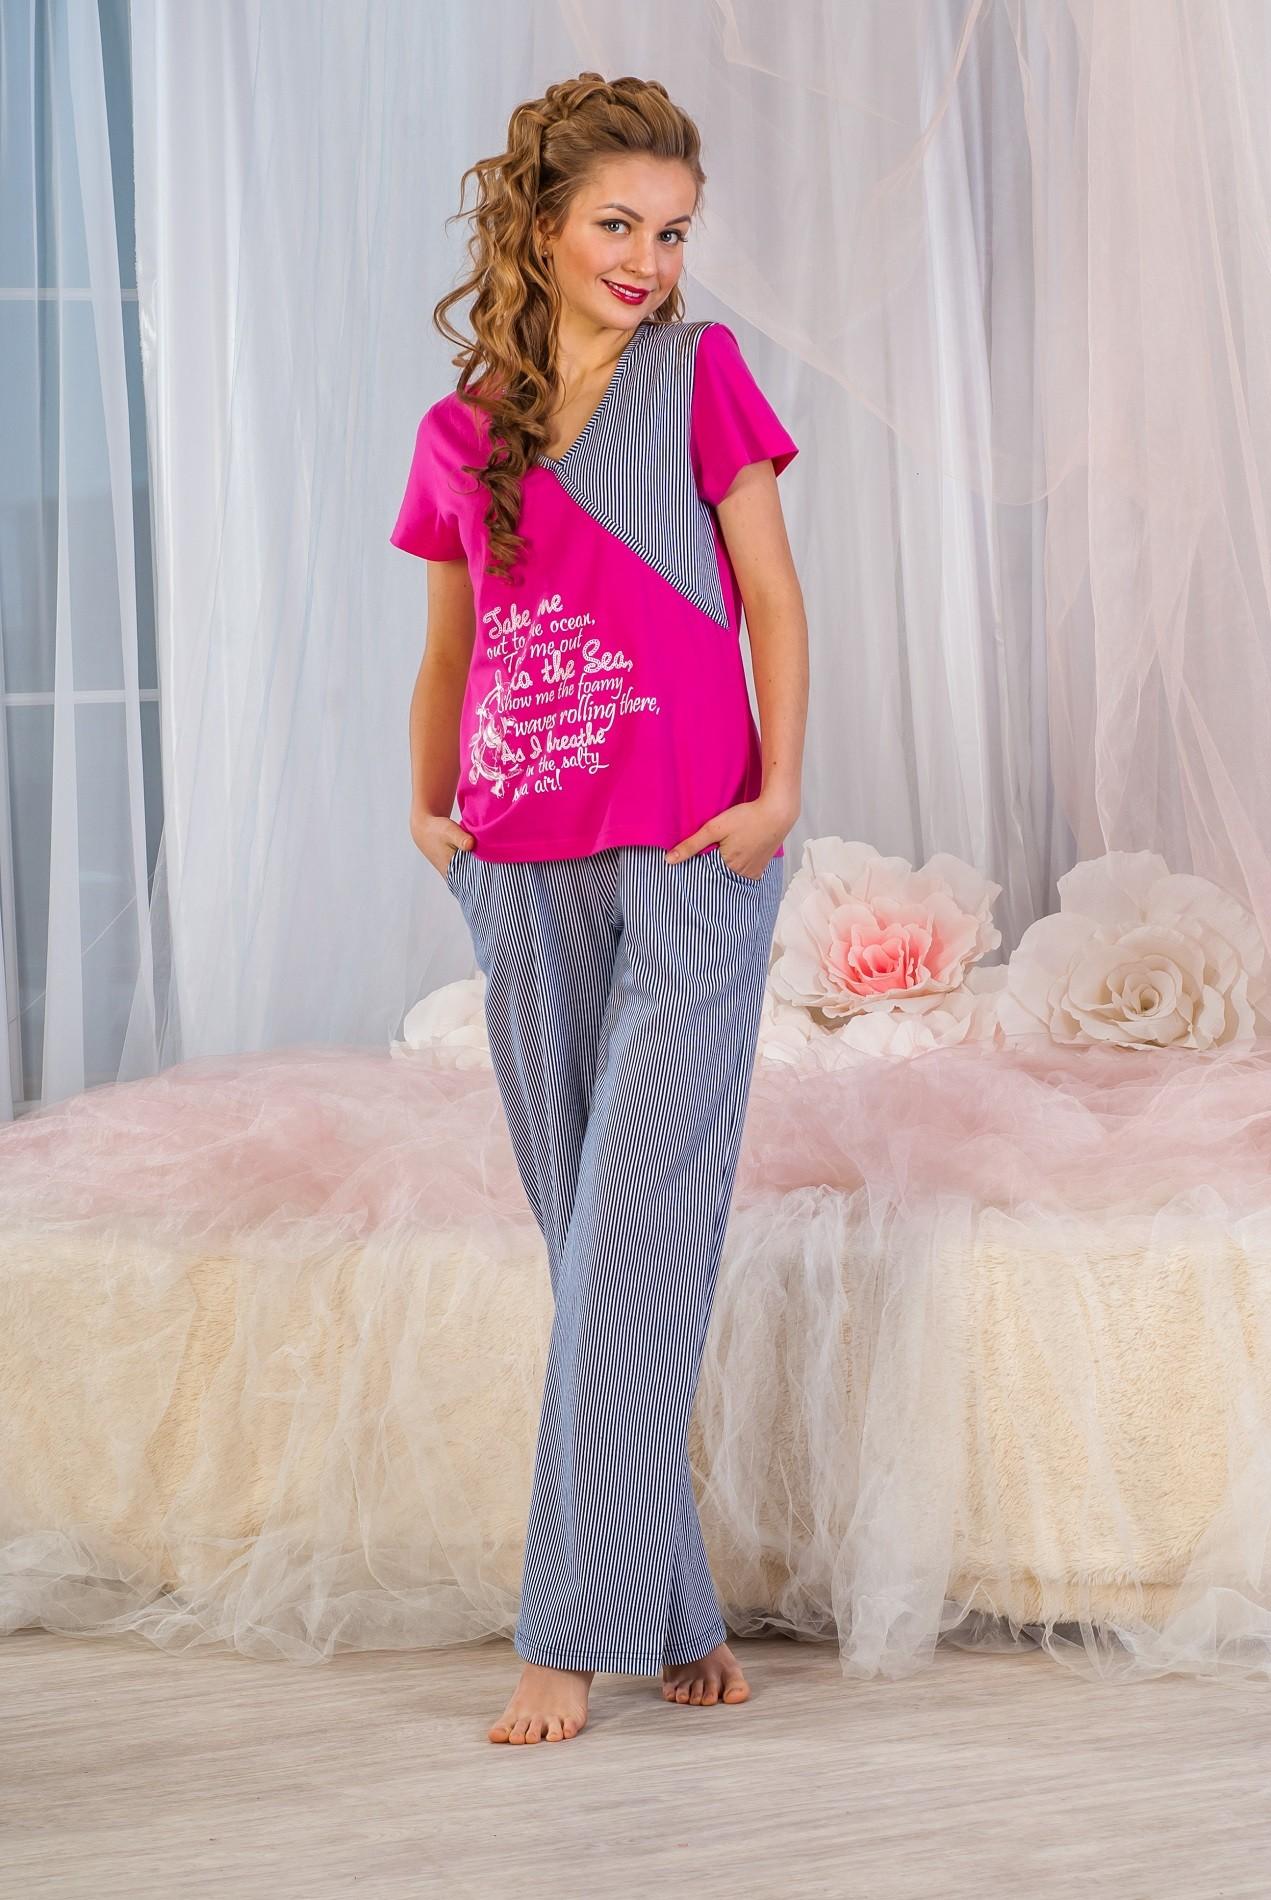 Костюм женский Шторм футболка и брюкиКостюмы<br><br><br>Размер: 44